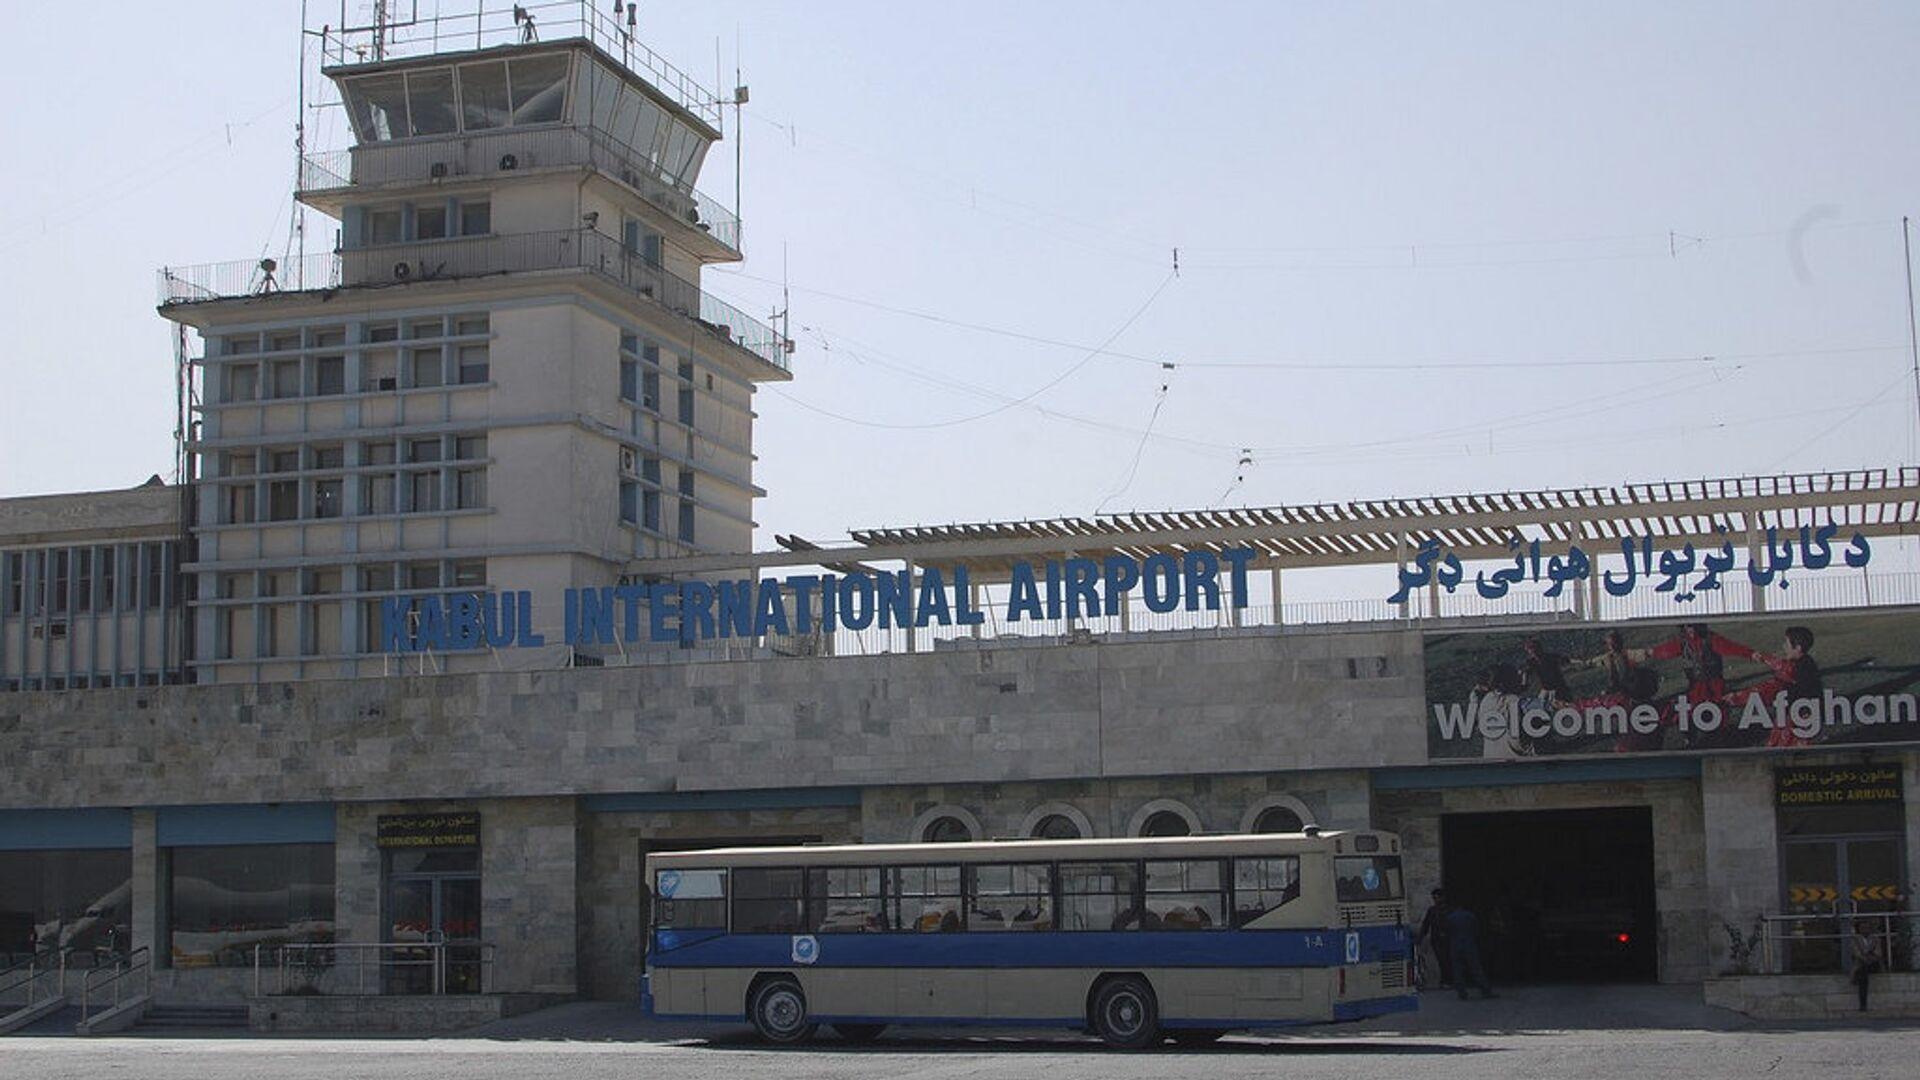 Международный аэропорт Кабула Хаджи Раваш - РИА Новости, 1920, 02.08.2021